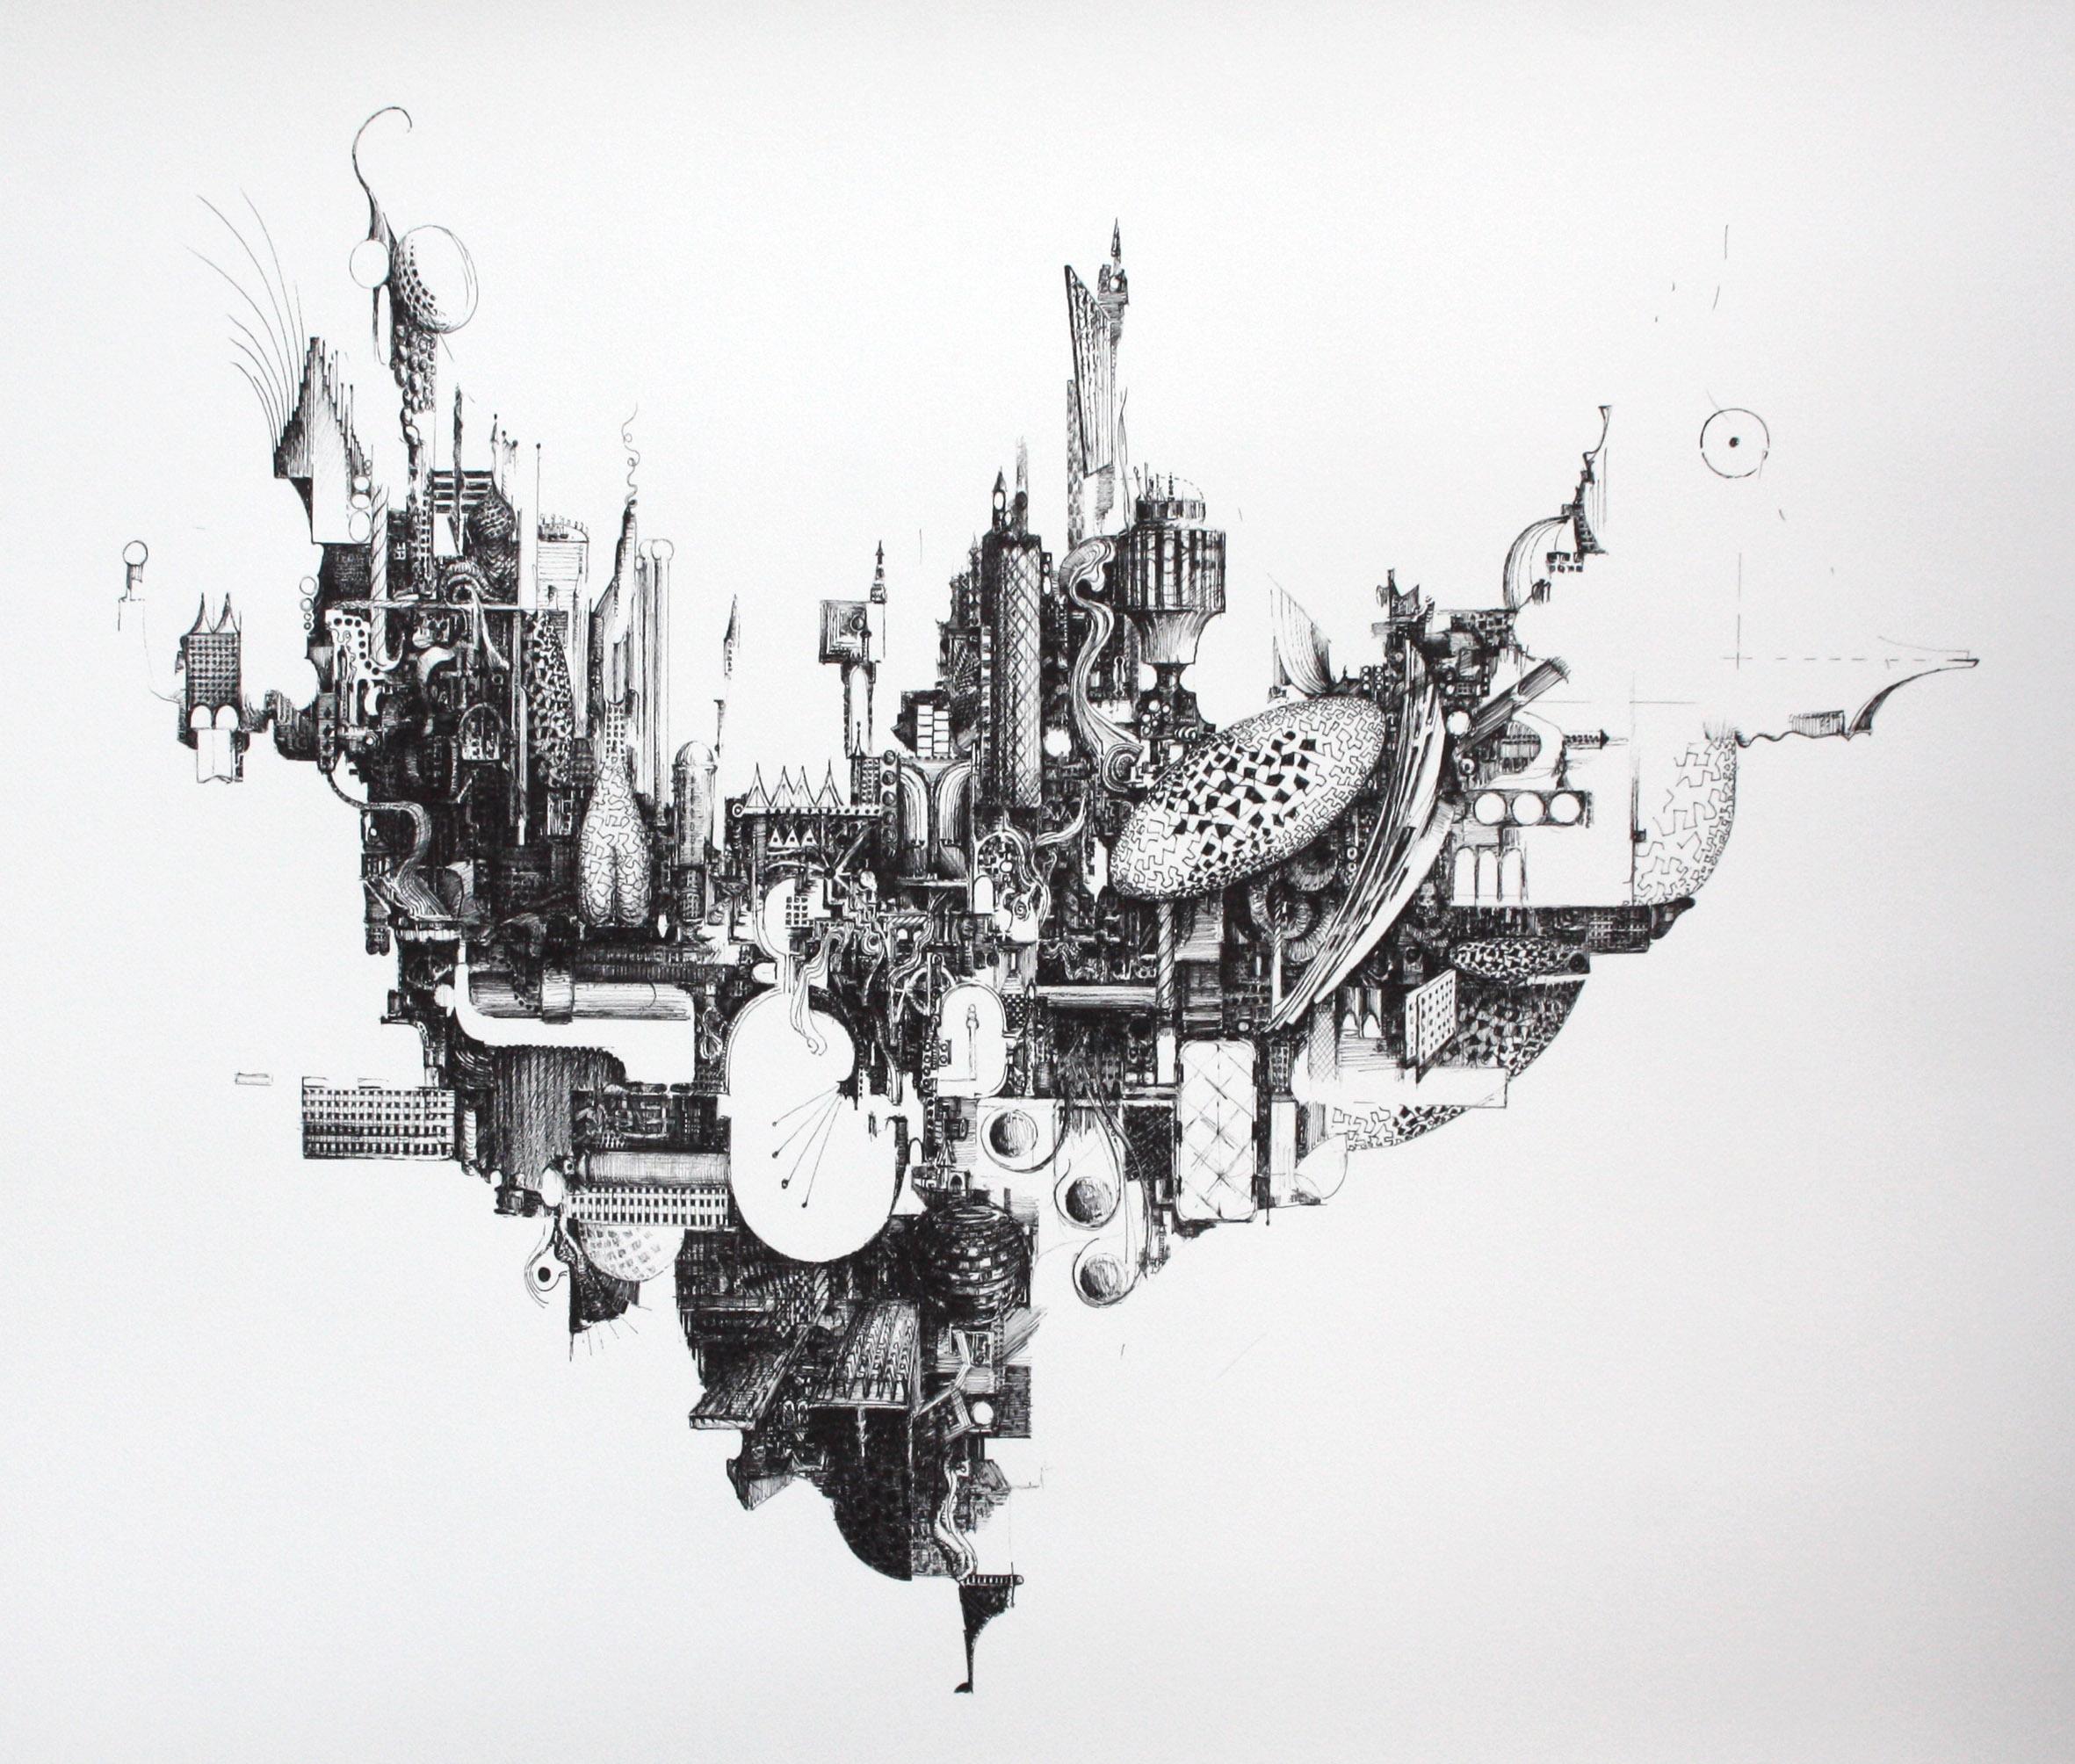 Art Show - Worldcon 75